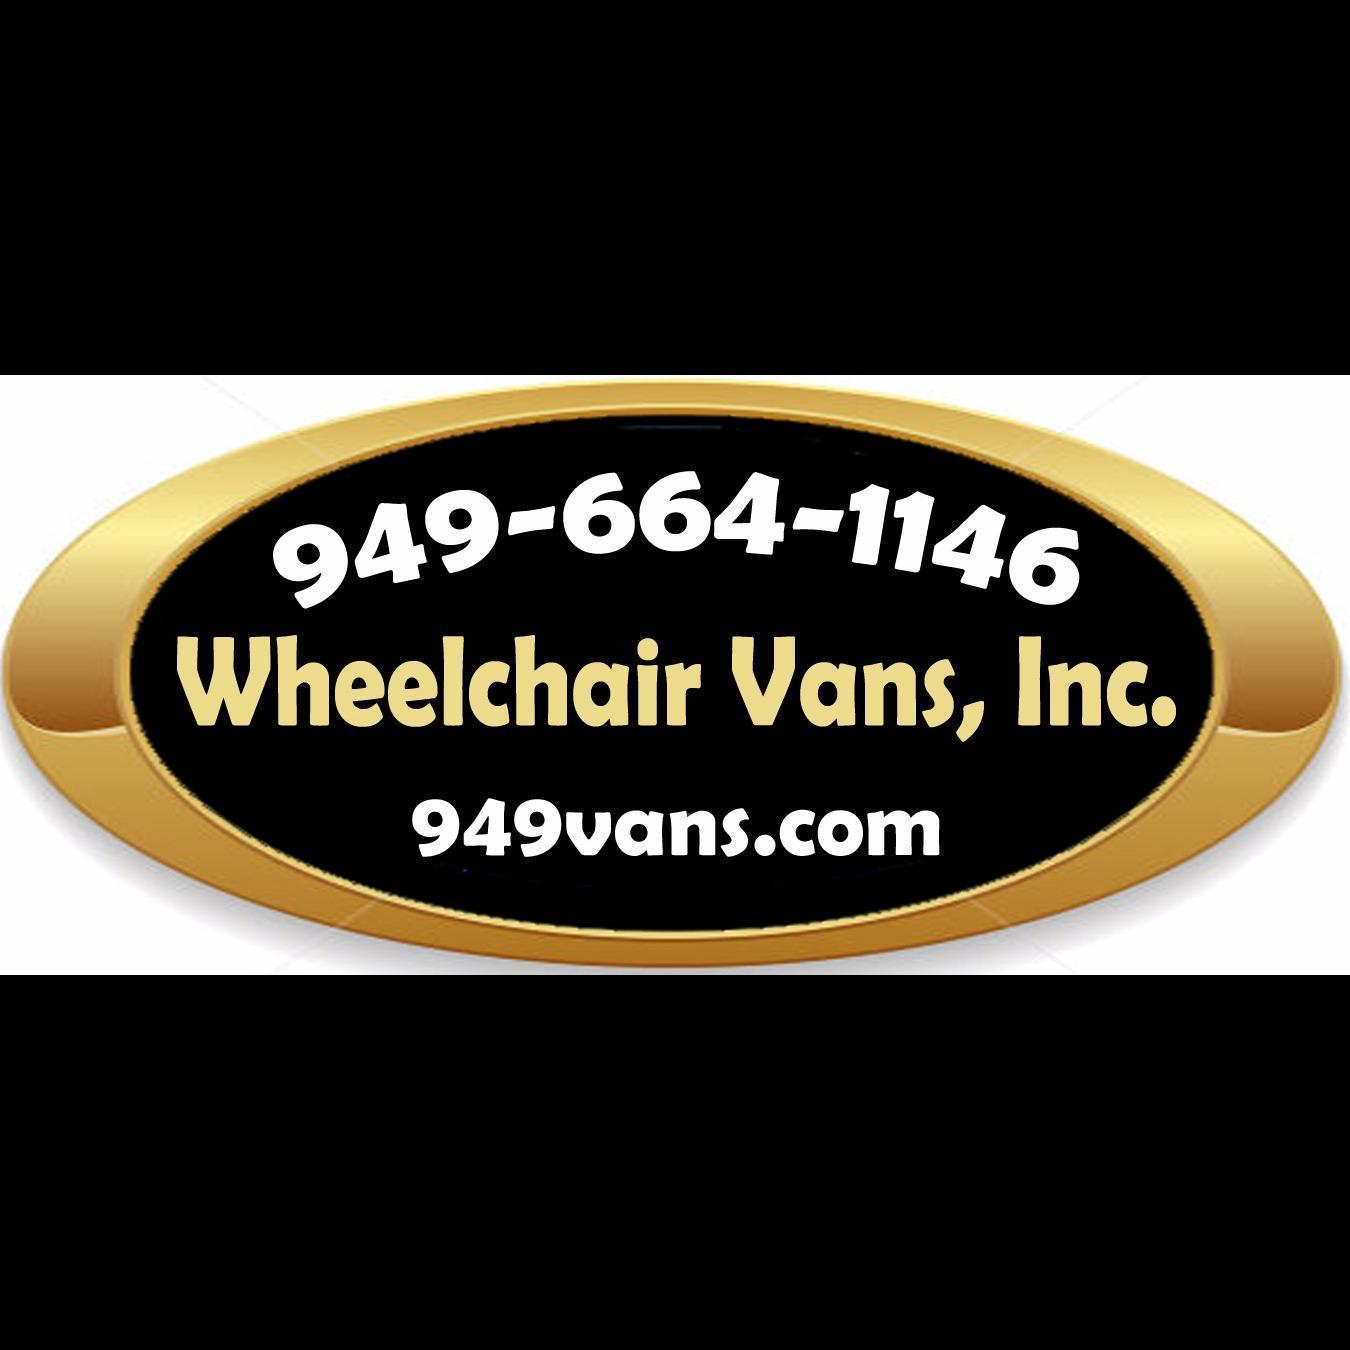 Wheelchair Vans Inc